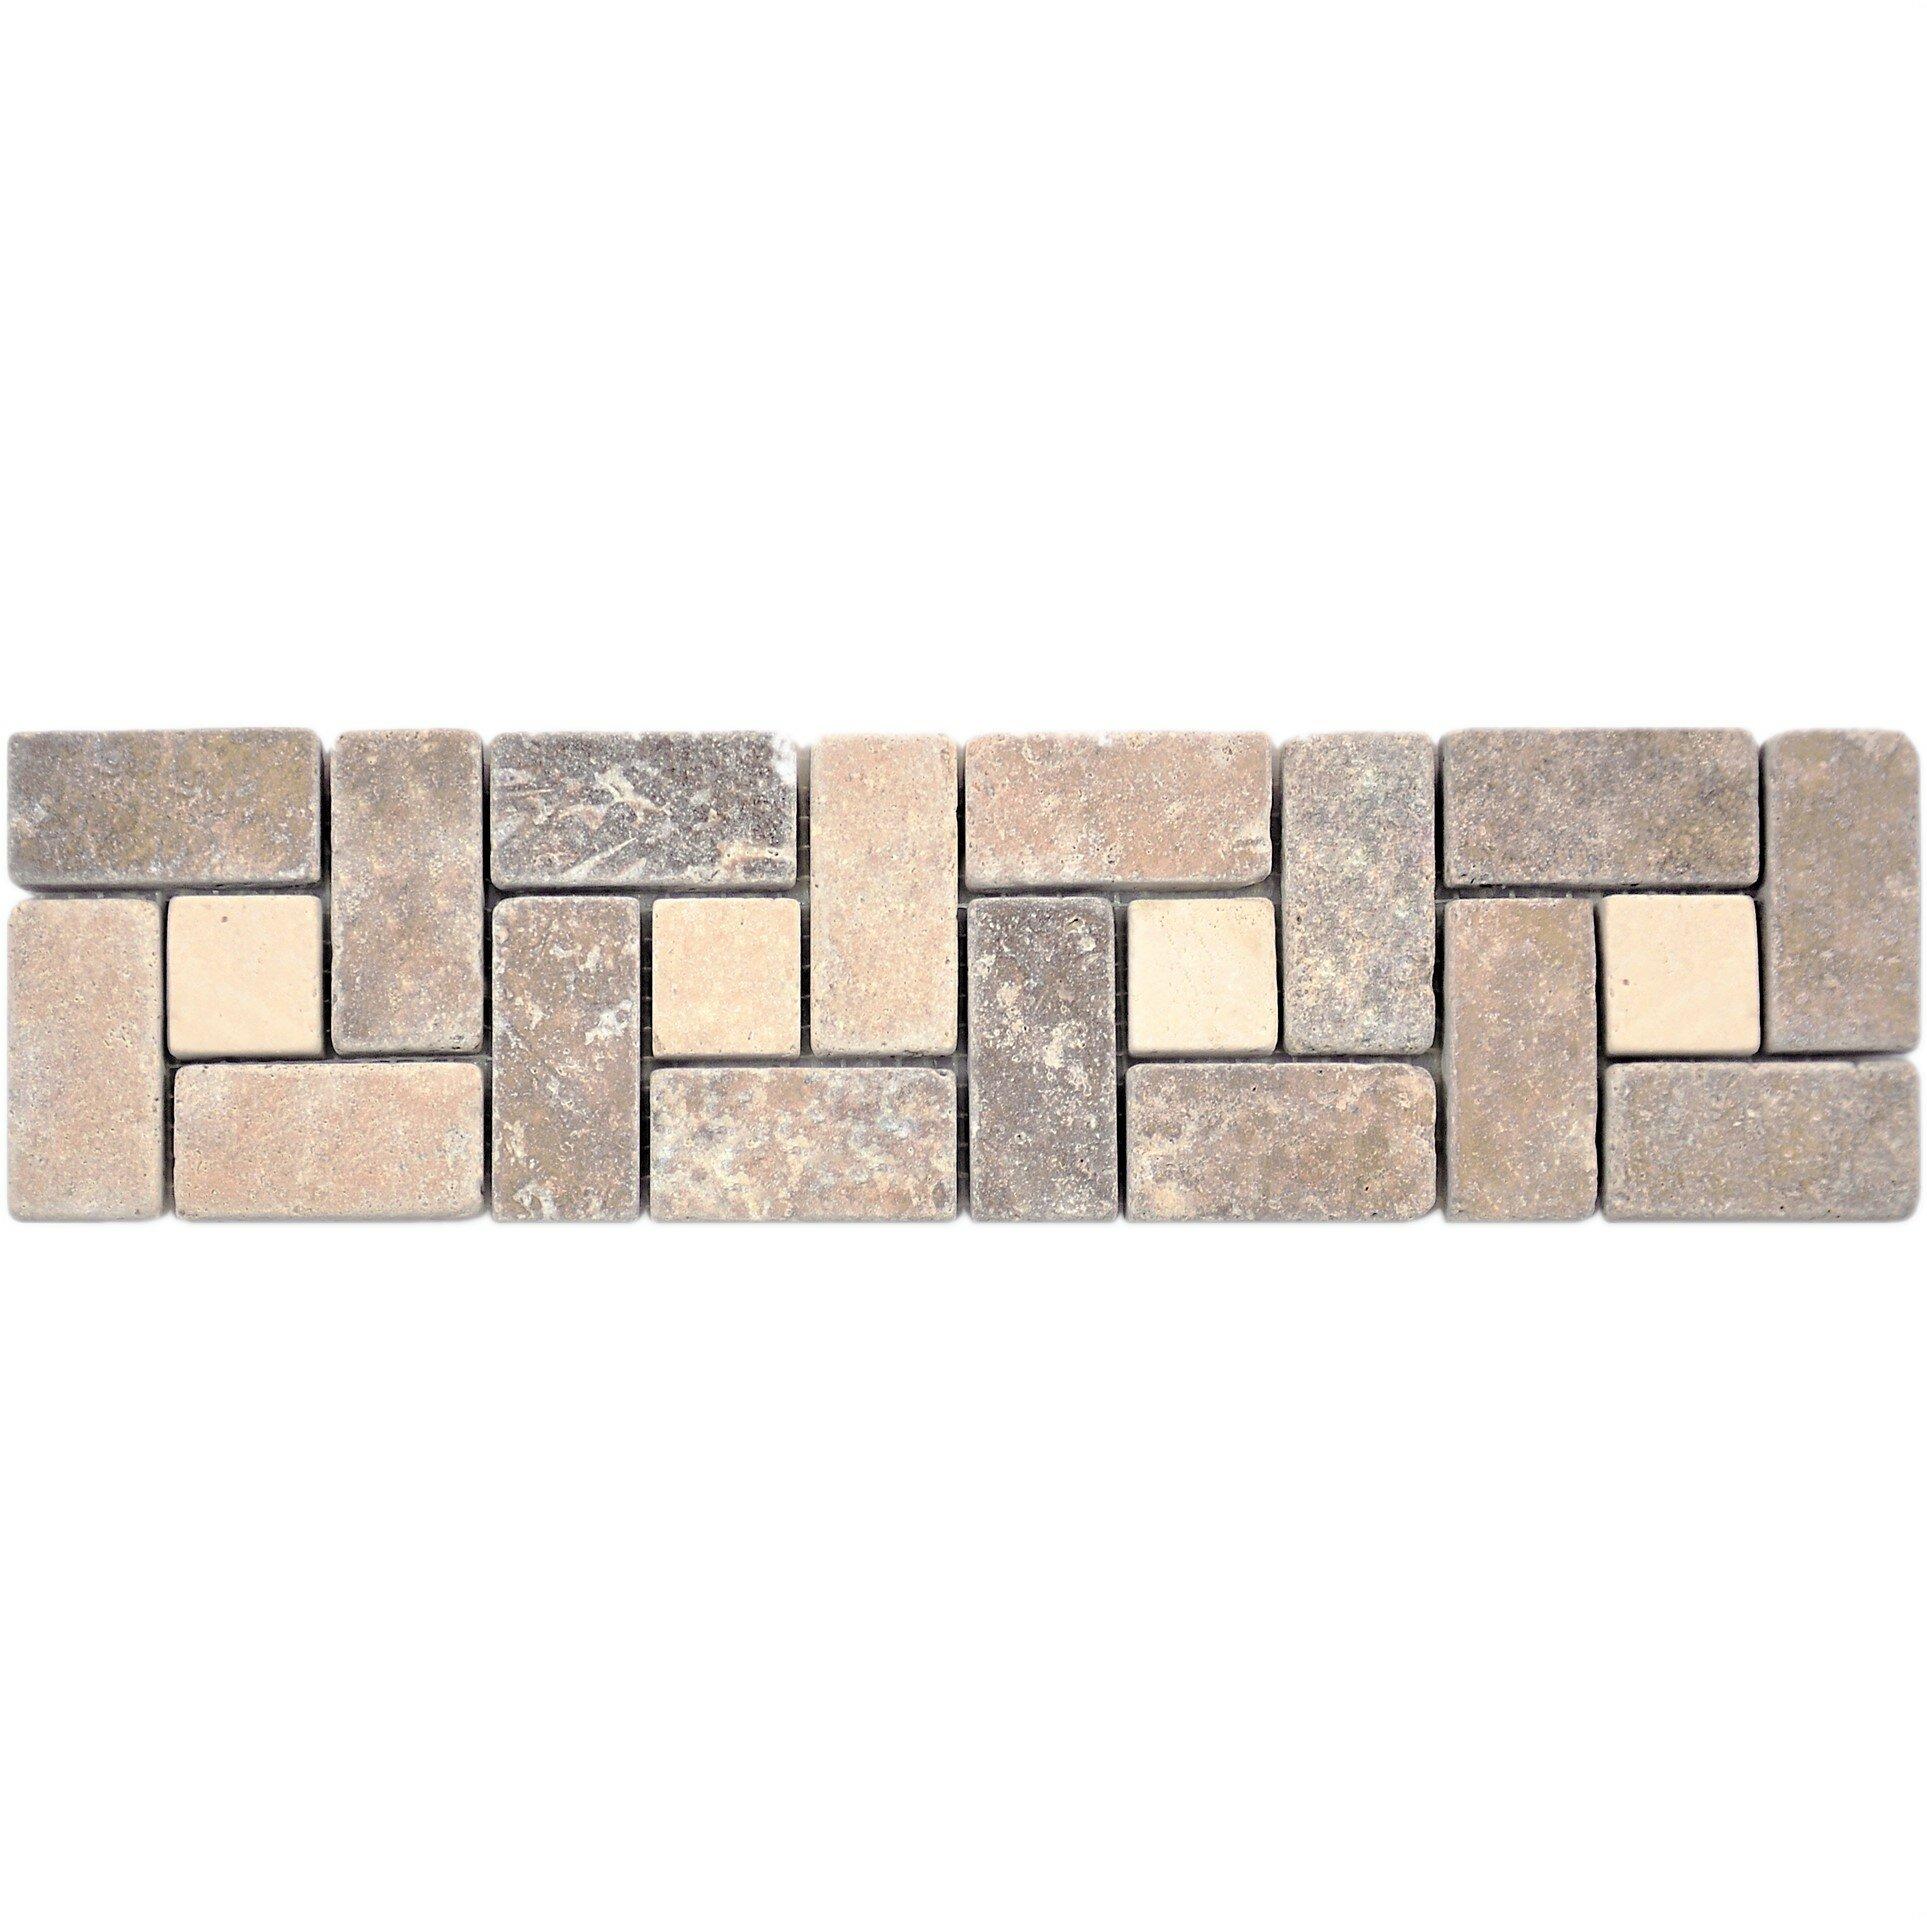 Travertine Noce Border Tile In Tumbled